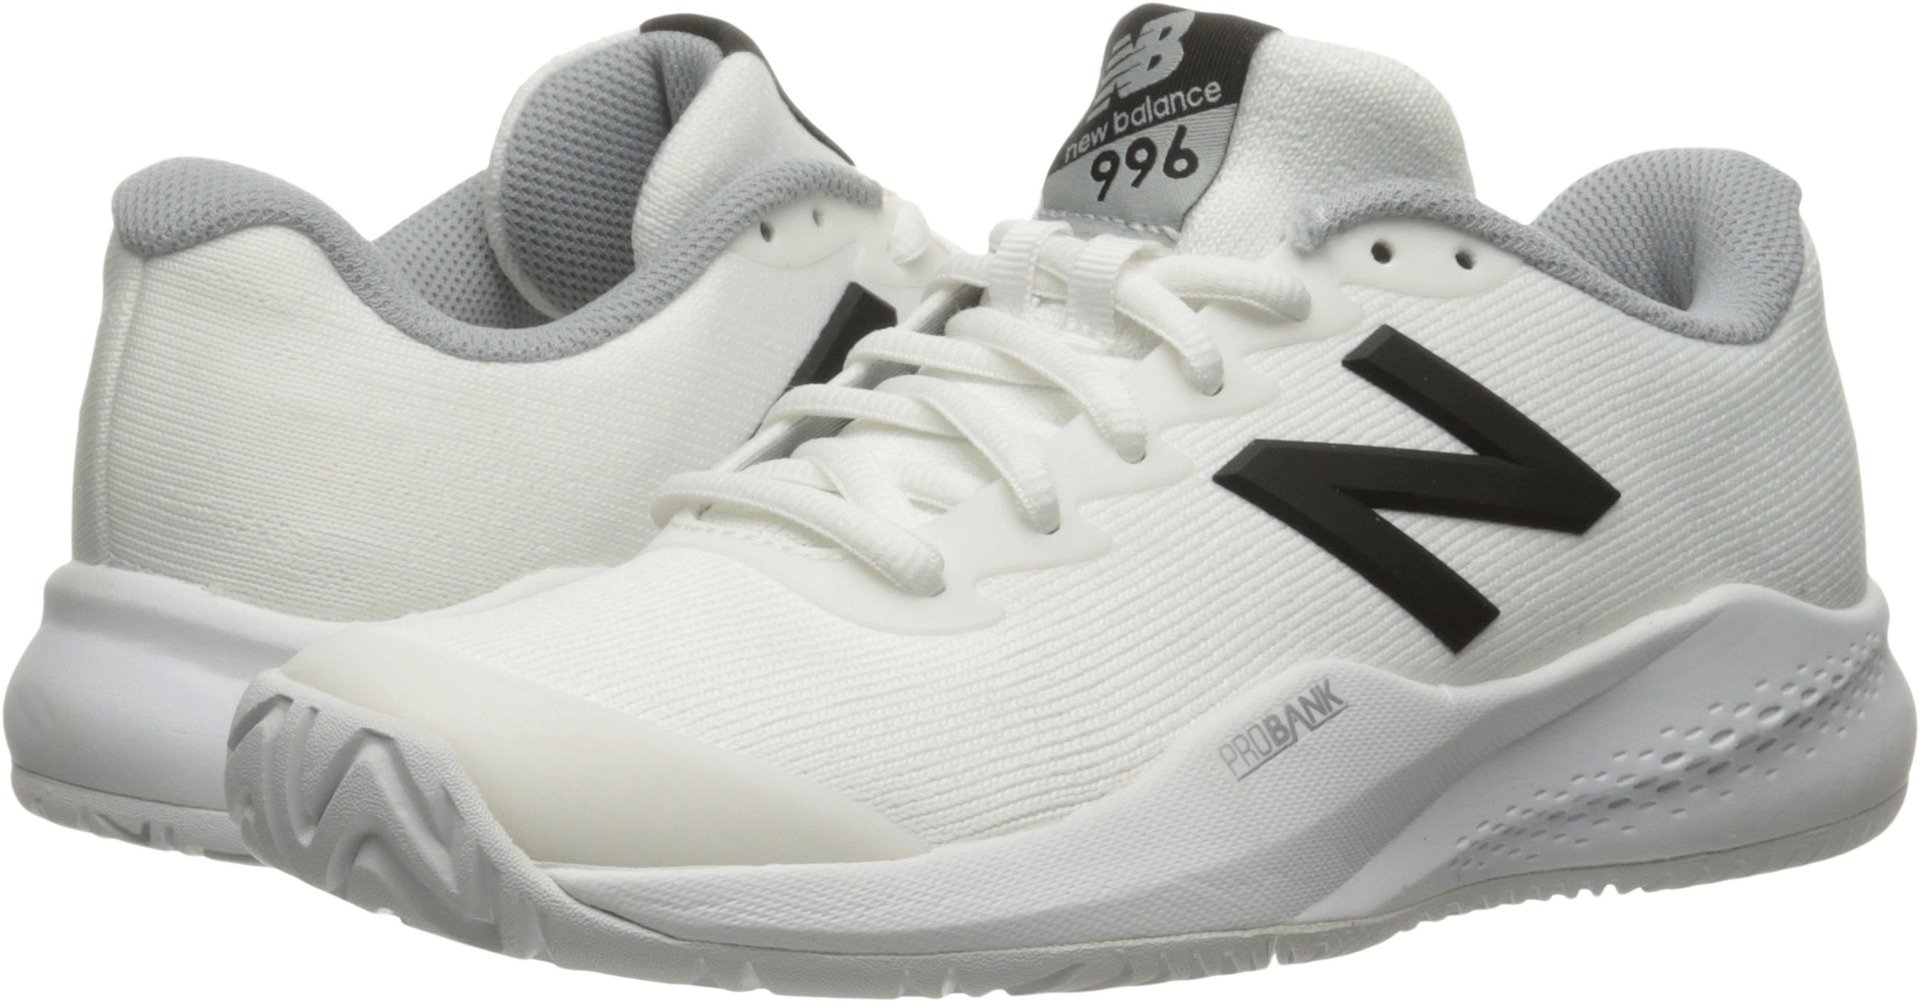 New Balance Women's 996v3 Tennis-Shoes,White/Black5.5 B US